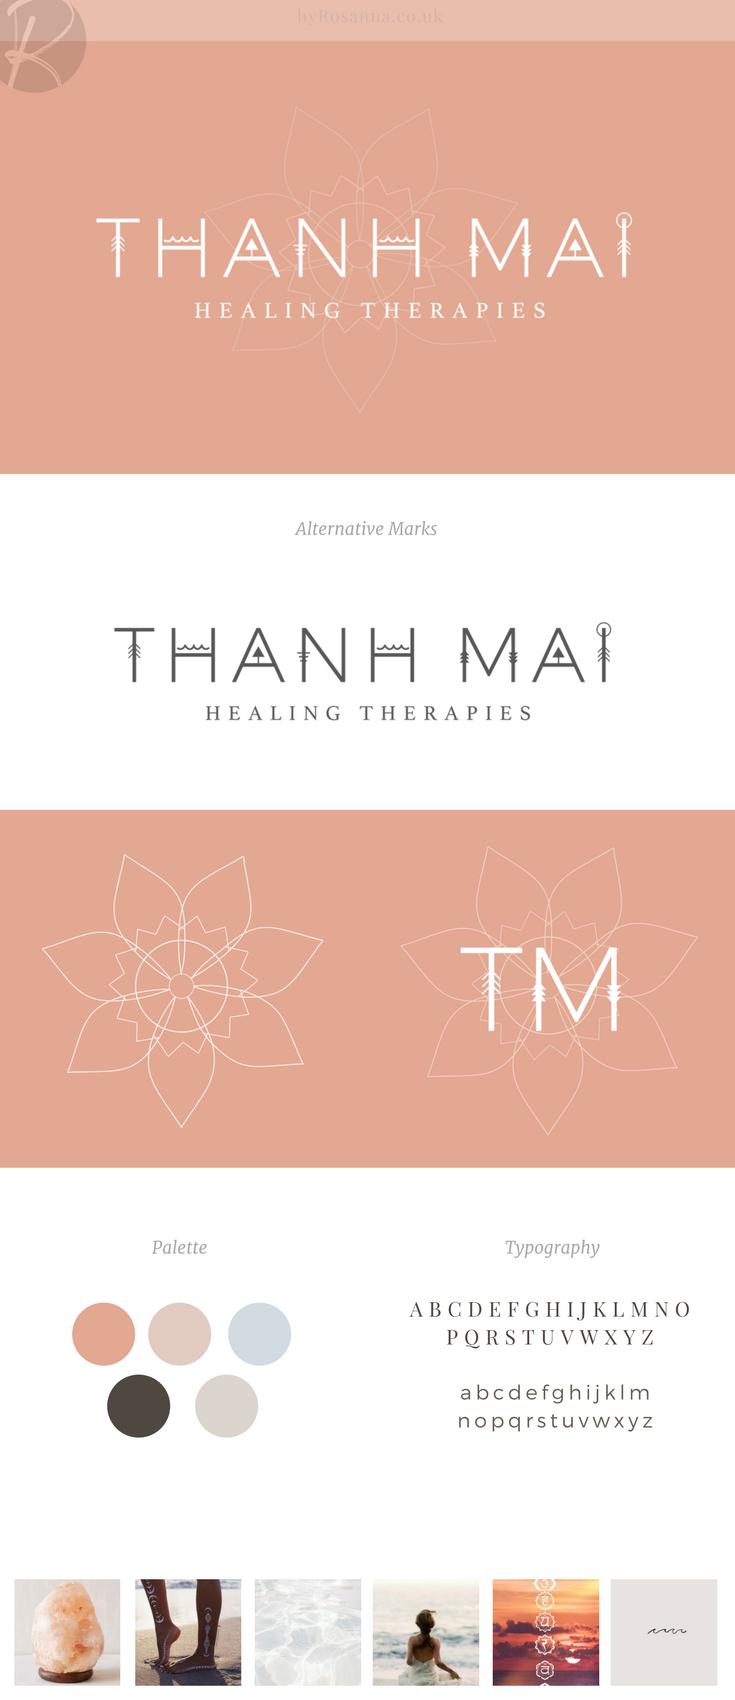 Therapies brand design